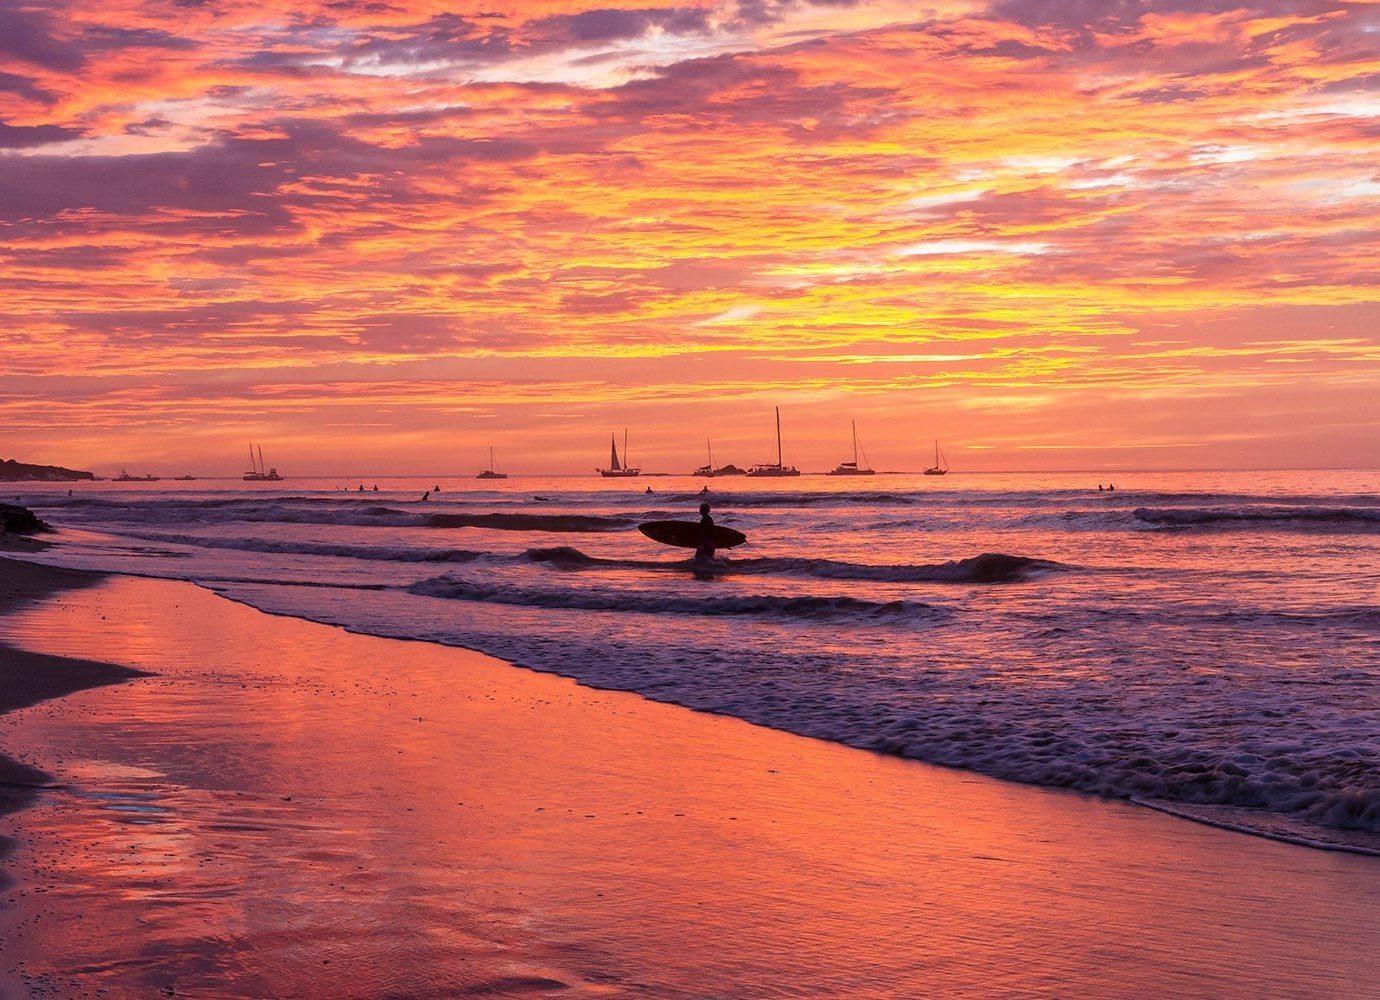 Trip Ideas water outdoor Sunset sky shore Sea sunrise Sun Beach afterglow horizon body of water Ocean dawn Coast cloud pier scene dusk wave evening morning reflection wind wave Nature setting sand